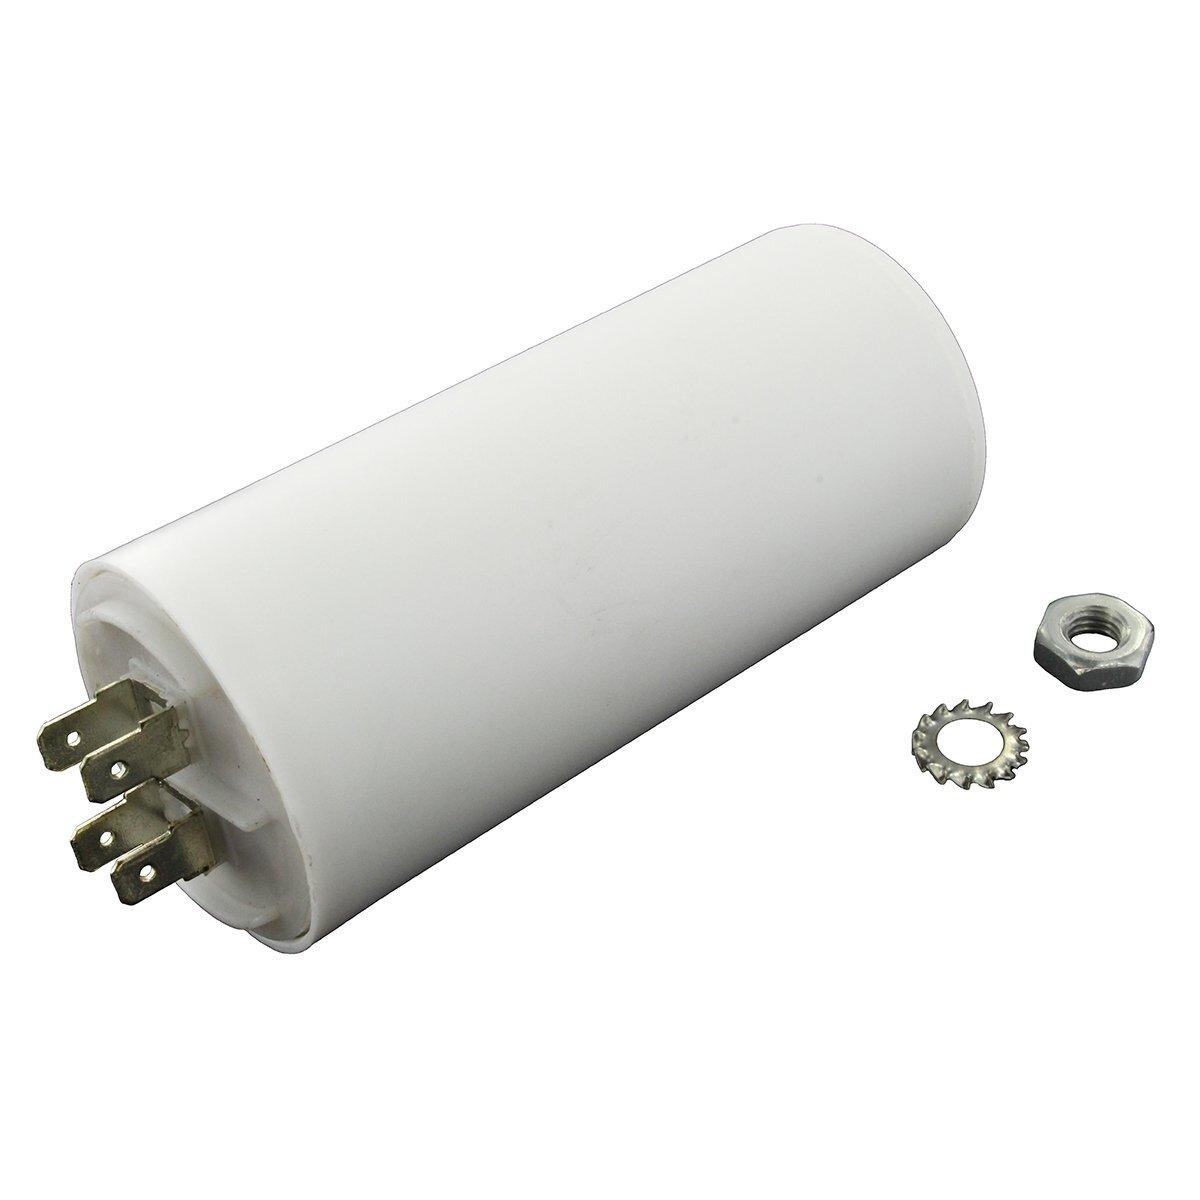 Universal 3.0uF  Capacitor